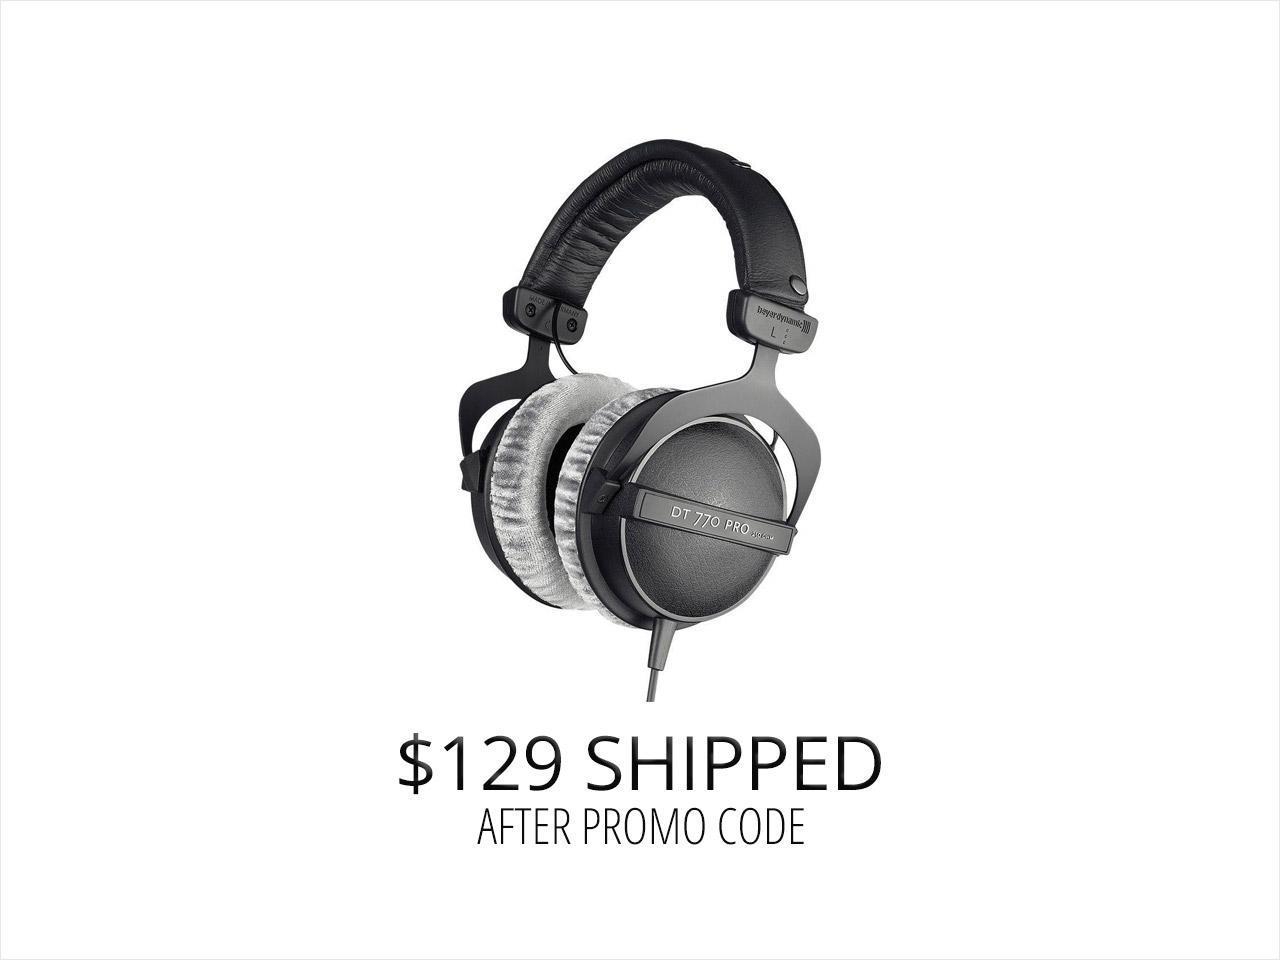 Beyerdynamic DT-770 Pro 250 Ω,Headphones $129 AC @NF